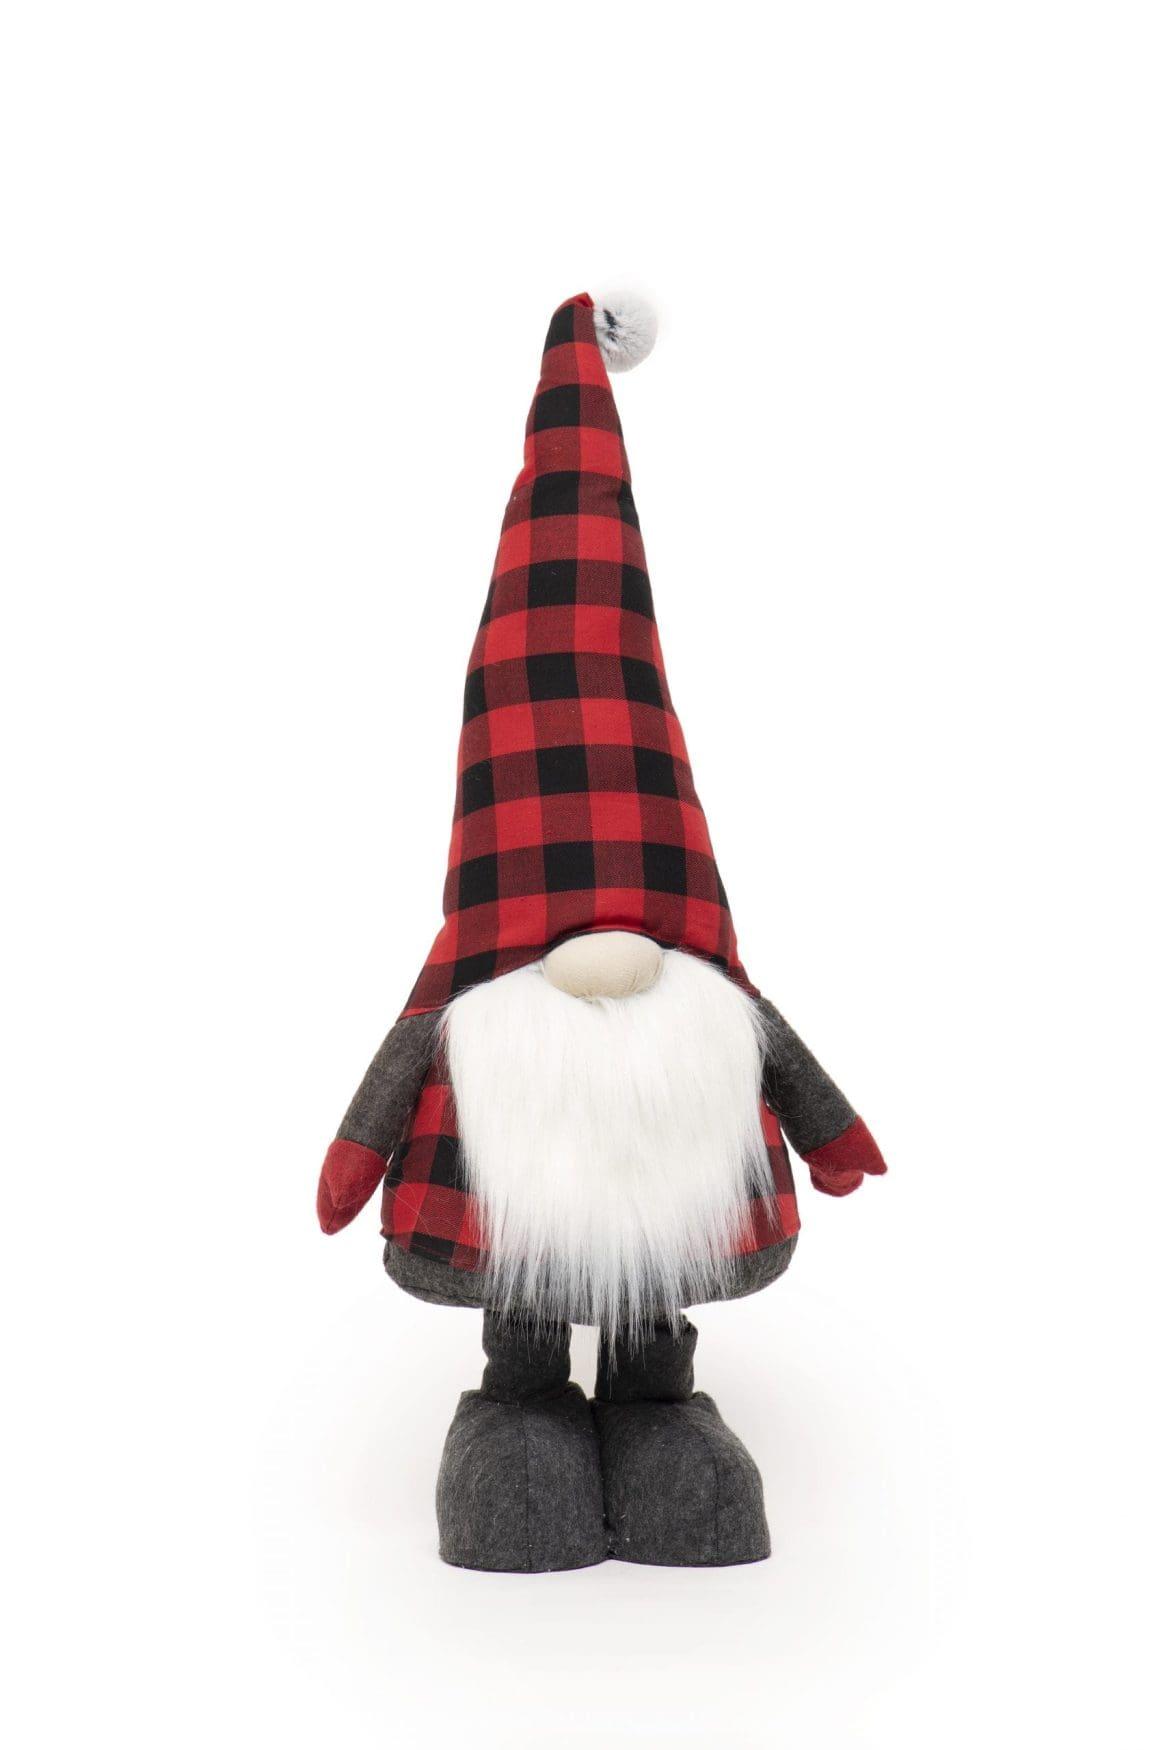 RED/BLACK BUFFALO PLAID EXPANDABLE GNOME WITH FUR POM & WHITE BEARD